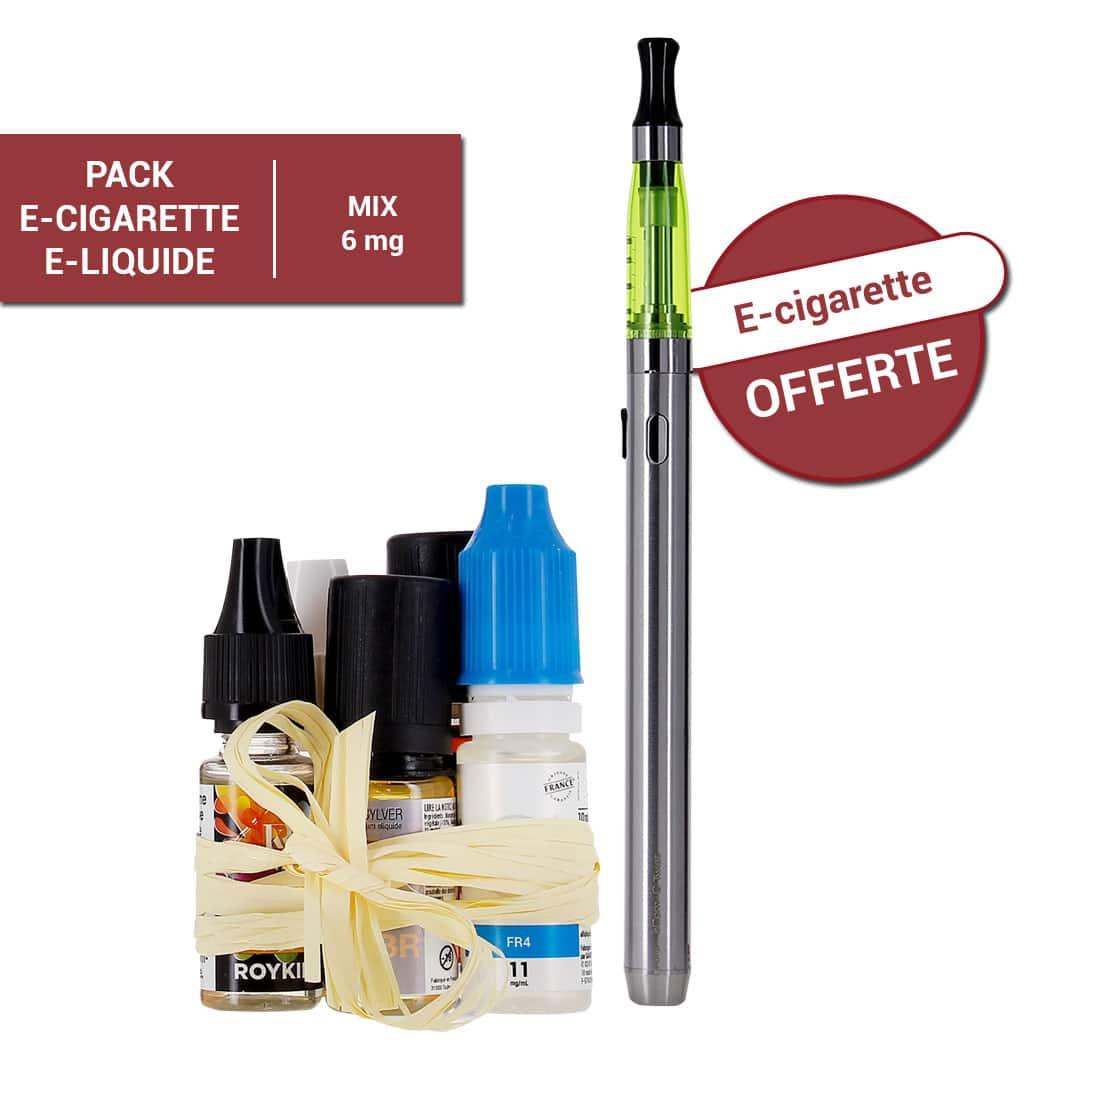 Photo de Pack e-cigarette e-liquide 6 mg Mix